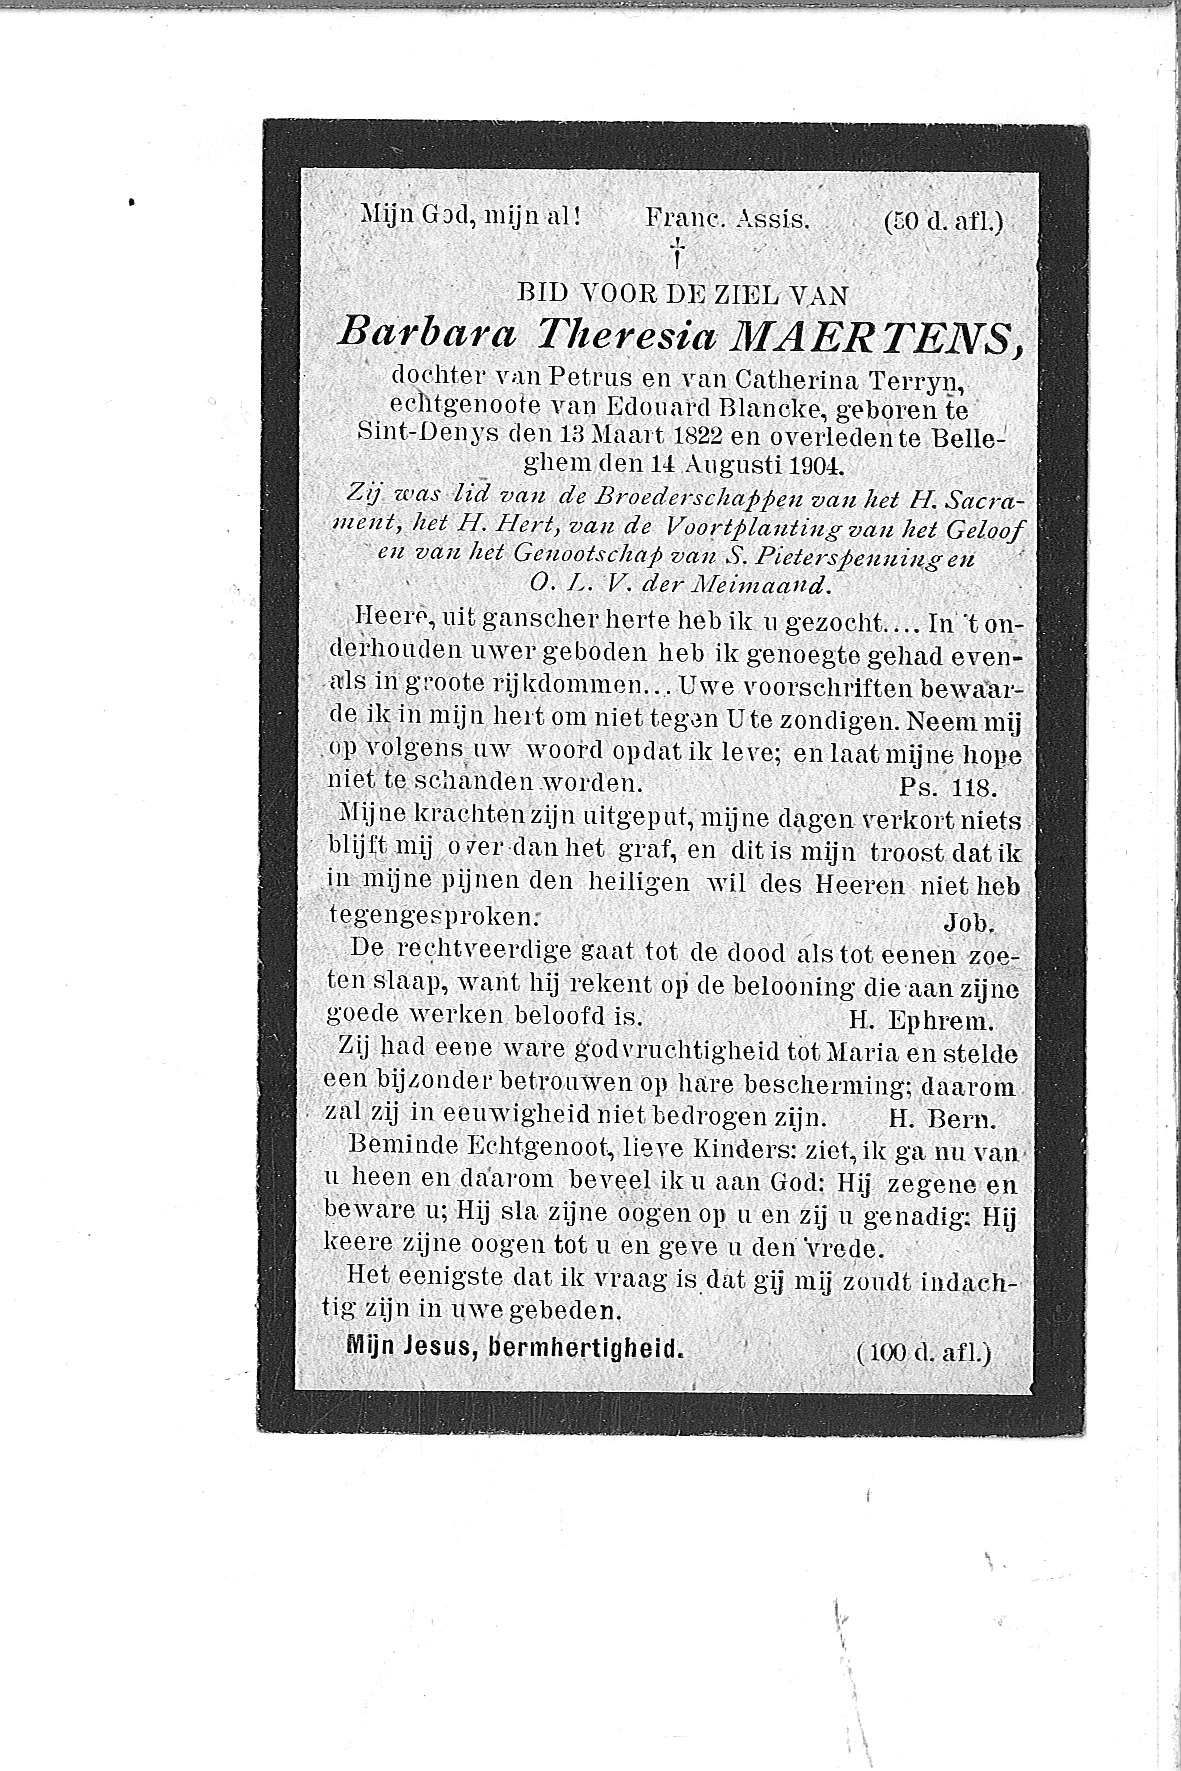 Barbara-Theresia(1904)20131203082456_00017.jpg